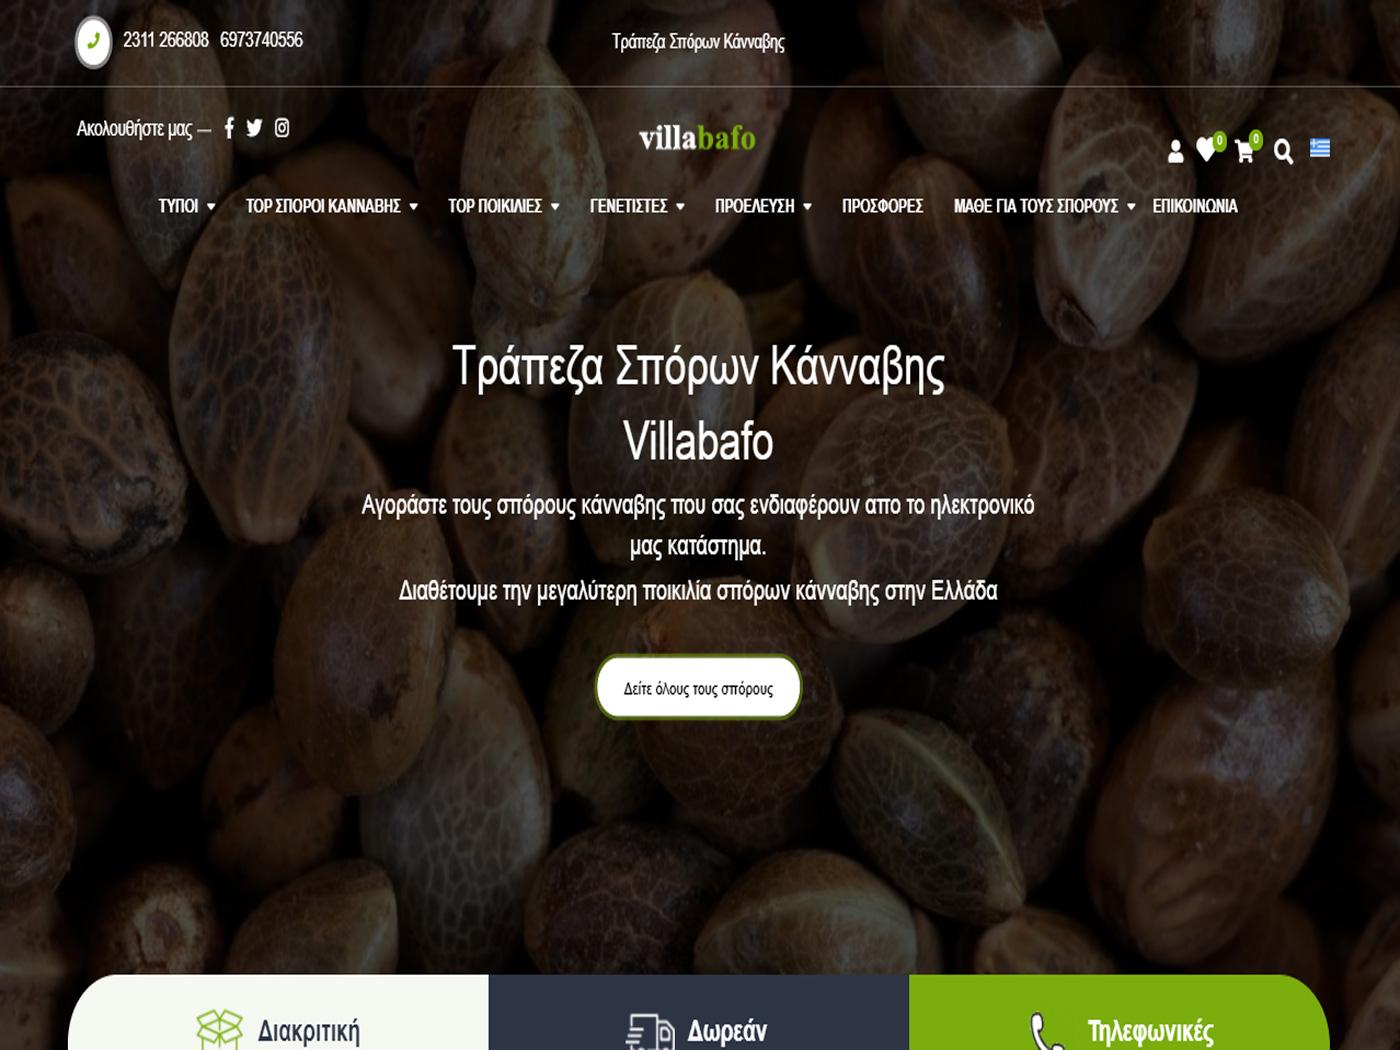 SEO υπηρεσίες Ιστοσελίδας Villabafo